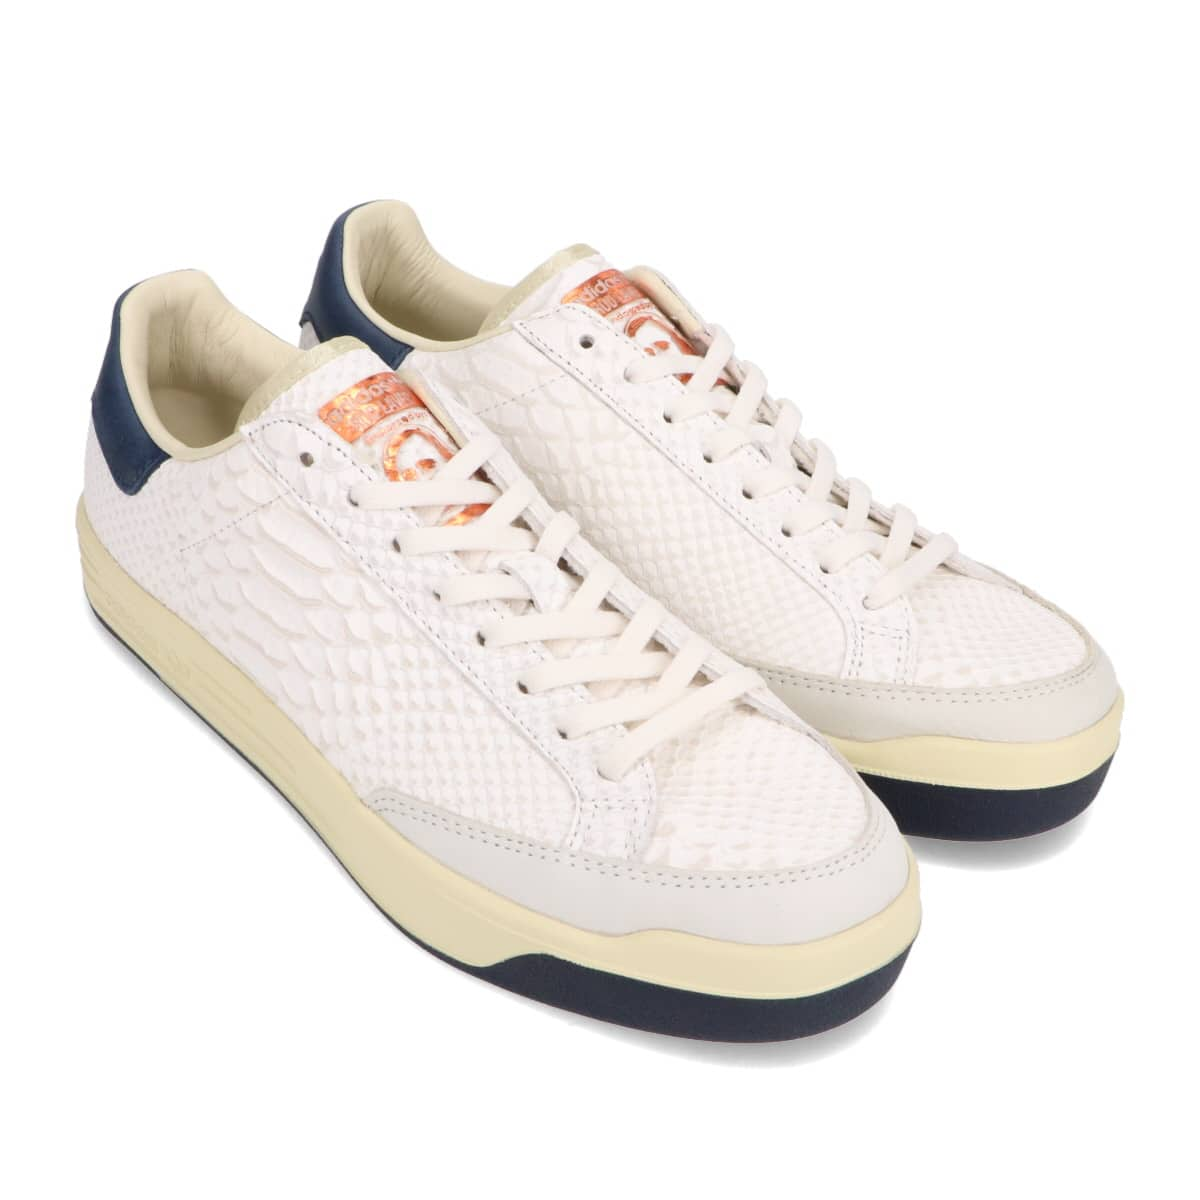 adidas ROD LAVER - CNSRTM CORE WHITE/CORE WHITE/COLLEGIATE NAVY 20FW-S_photo_large